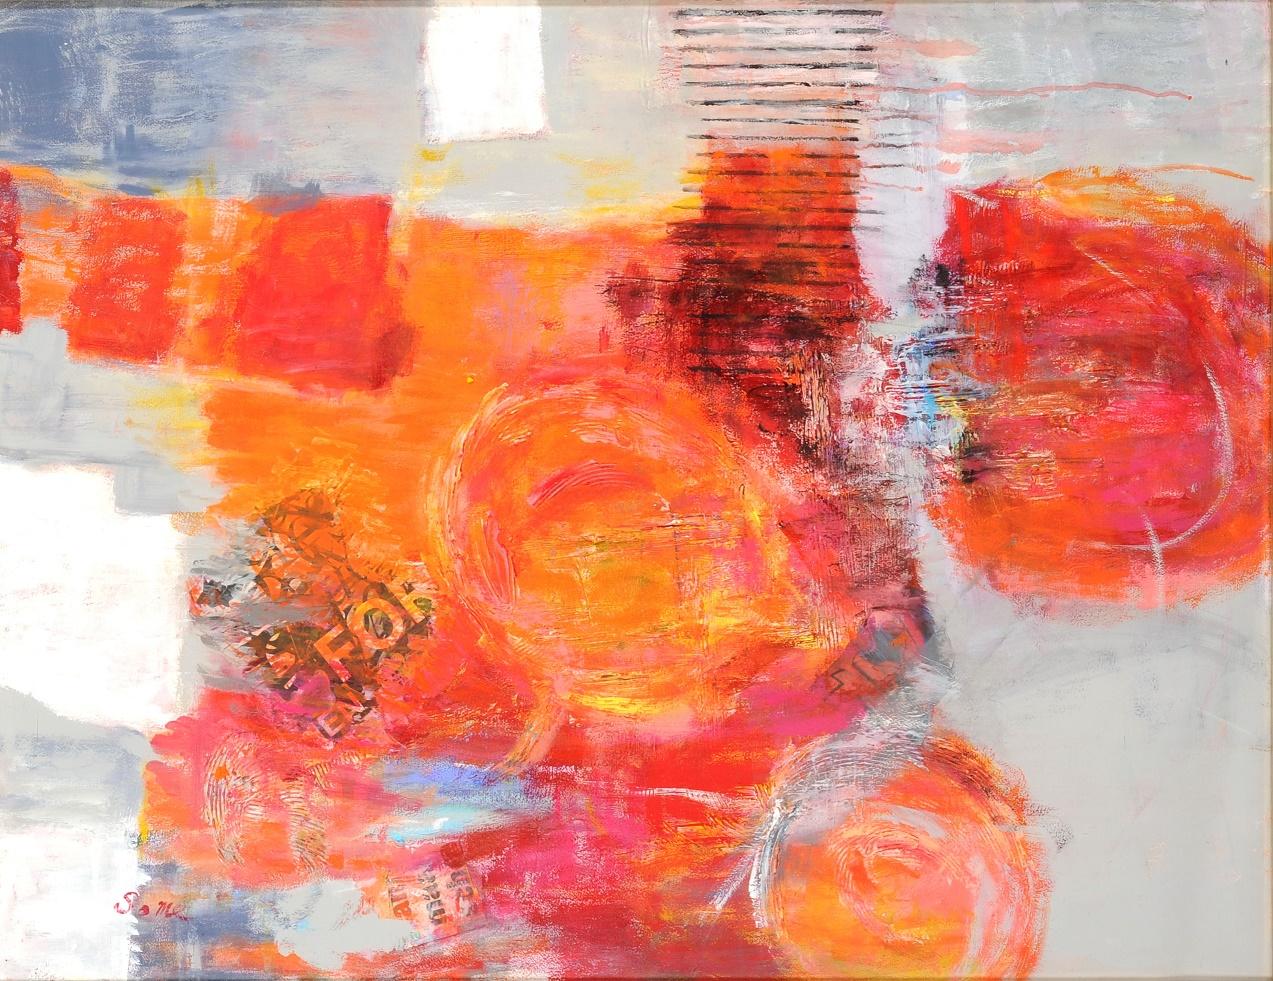 第70回滋賀県美術展覧会(平面の部)佳作「未知の誘い-Ⅰ」